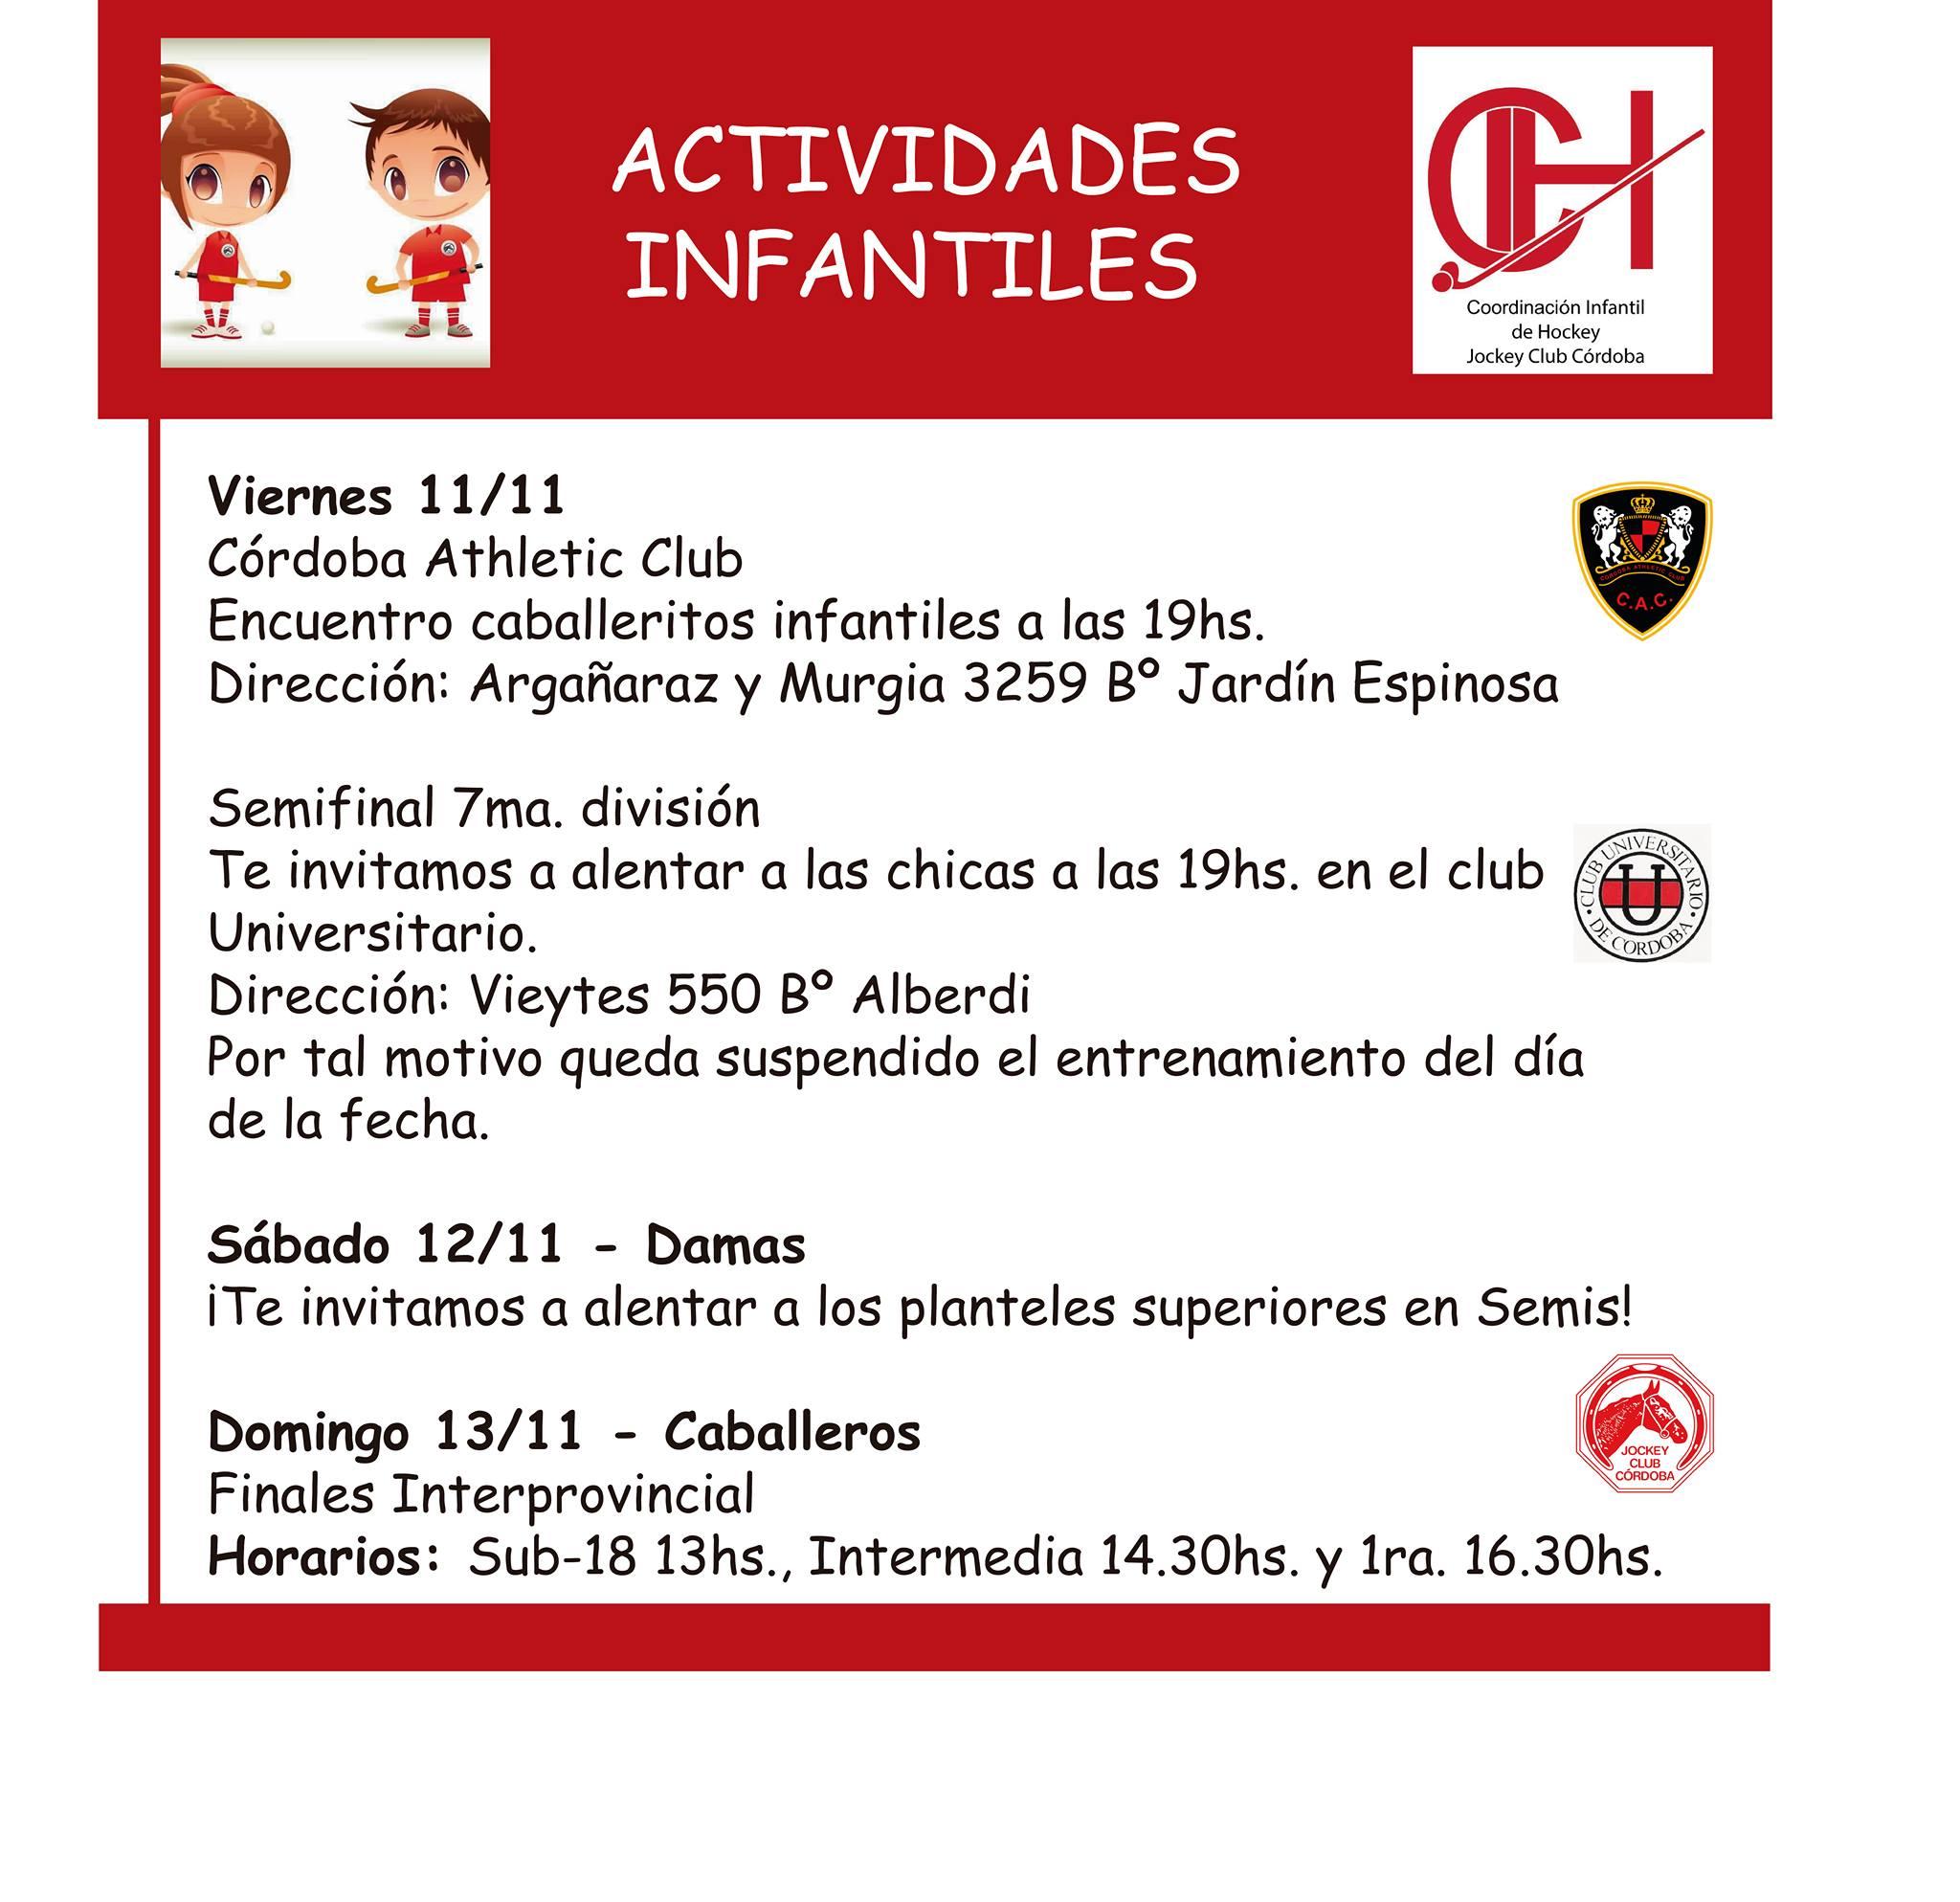 jcc-hockey-actividades-infantiles-11-12-13-noviembre